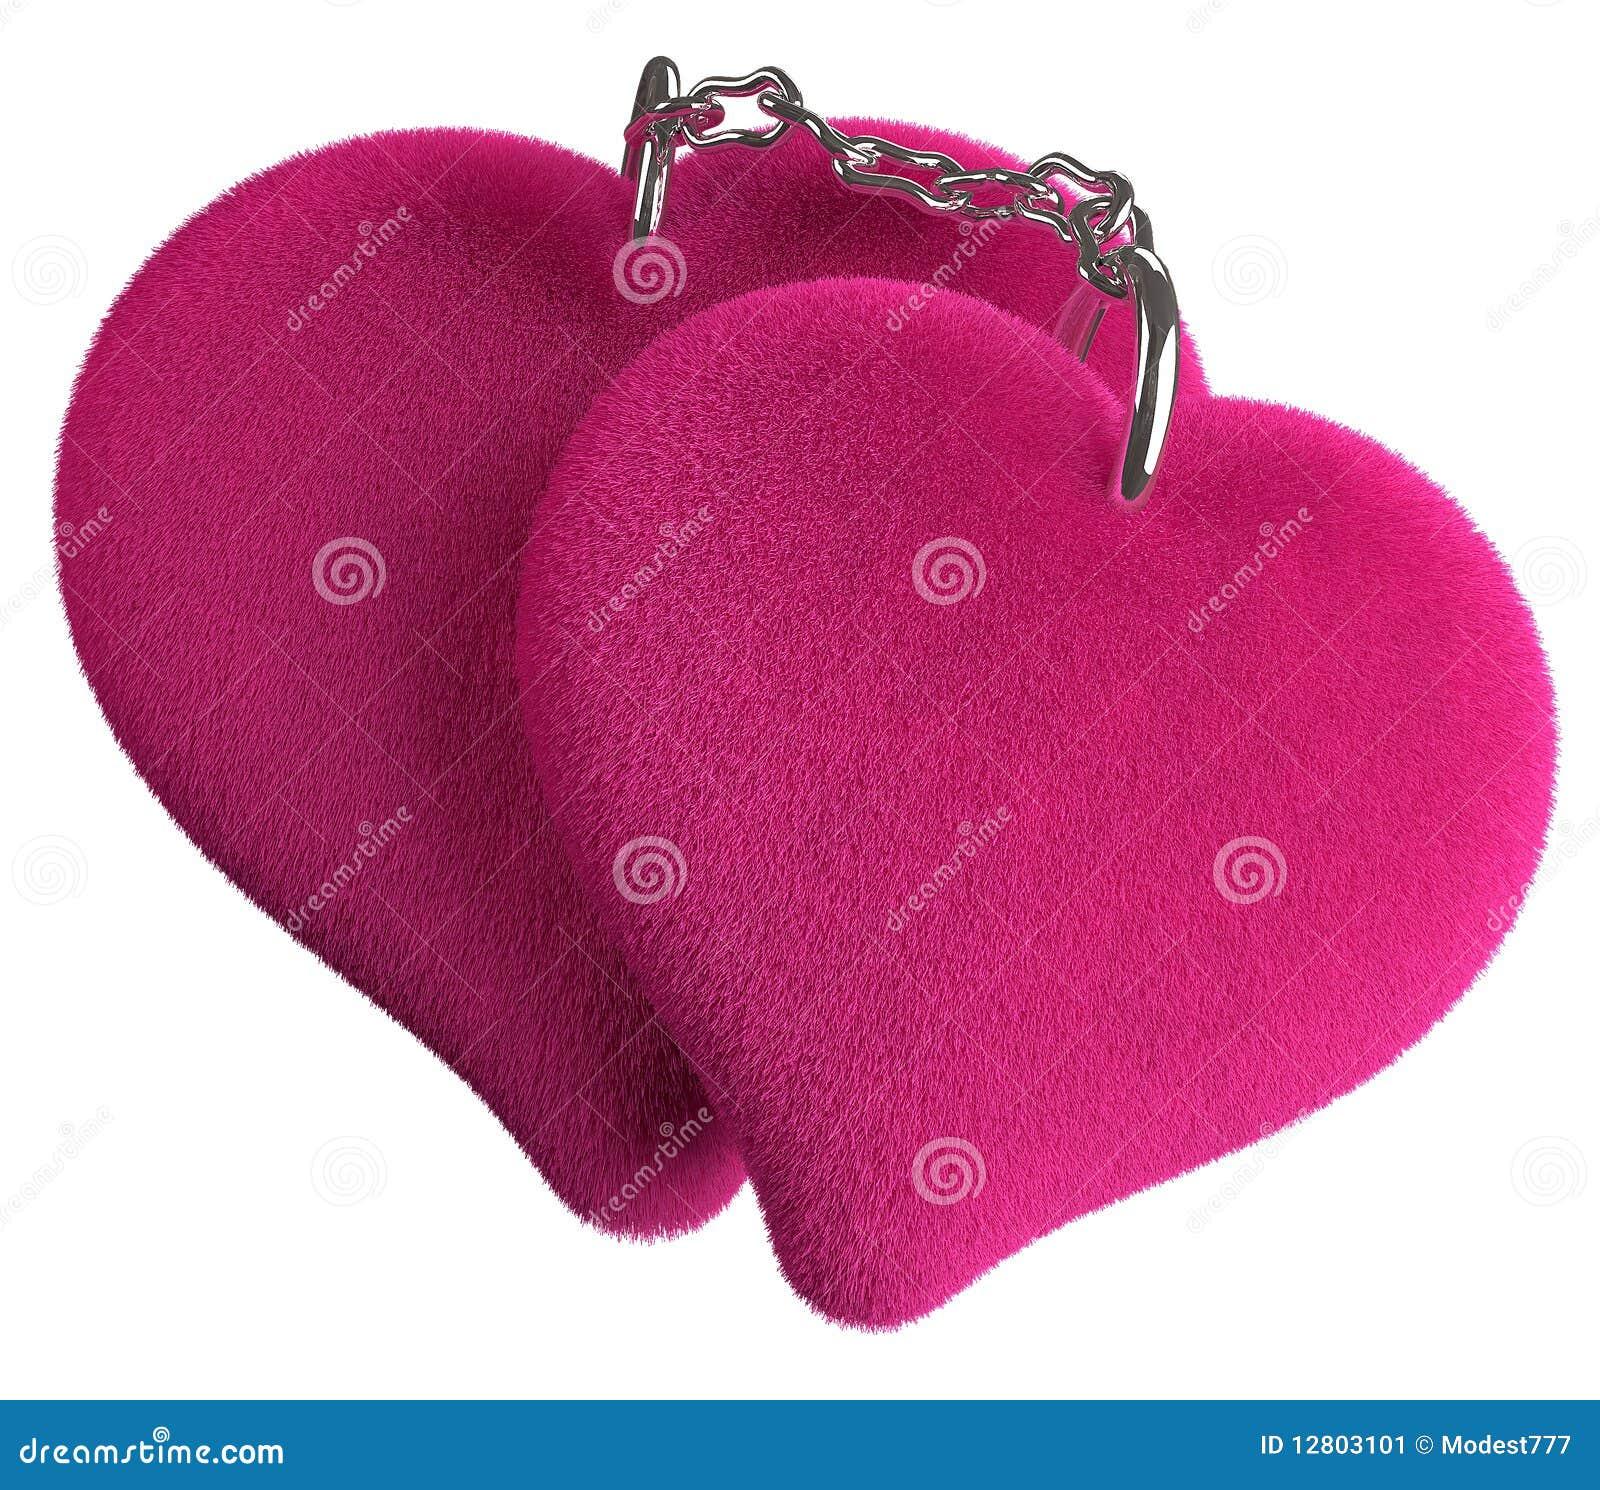 Grupo chain de dois corações loving